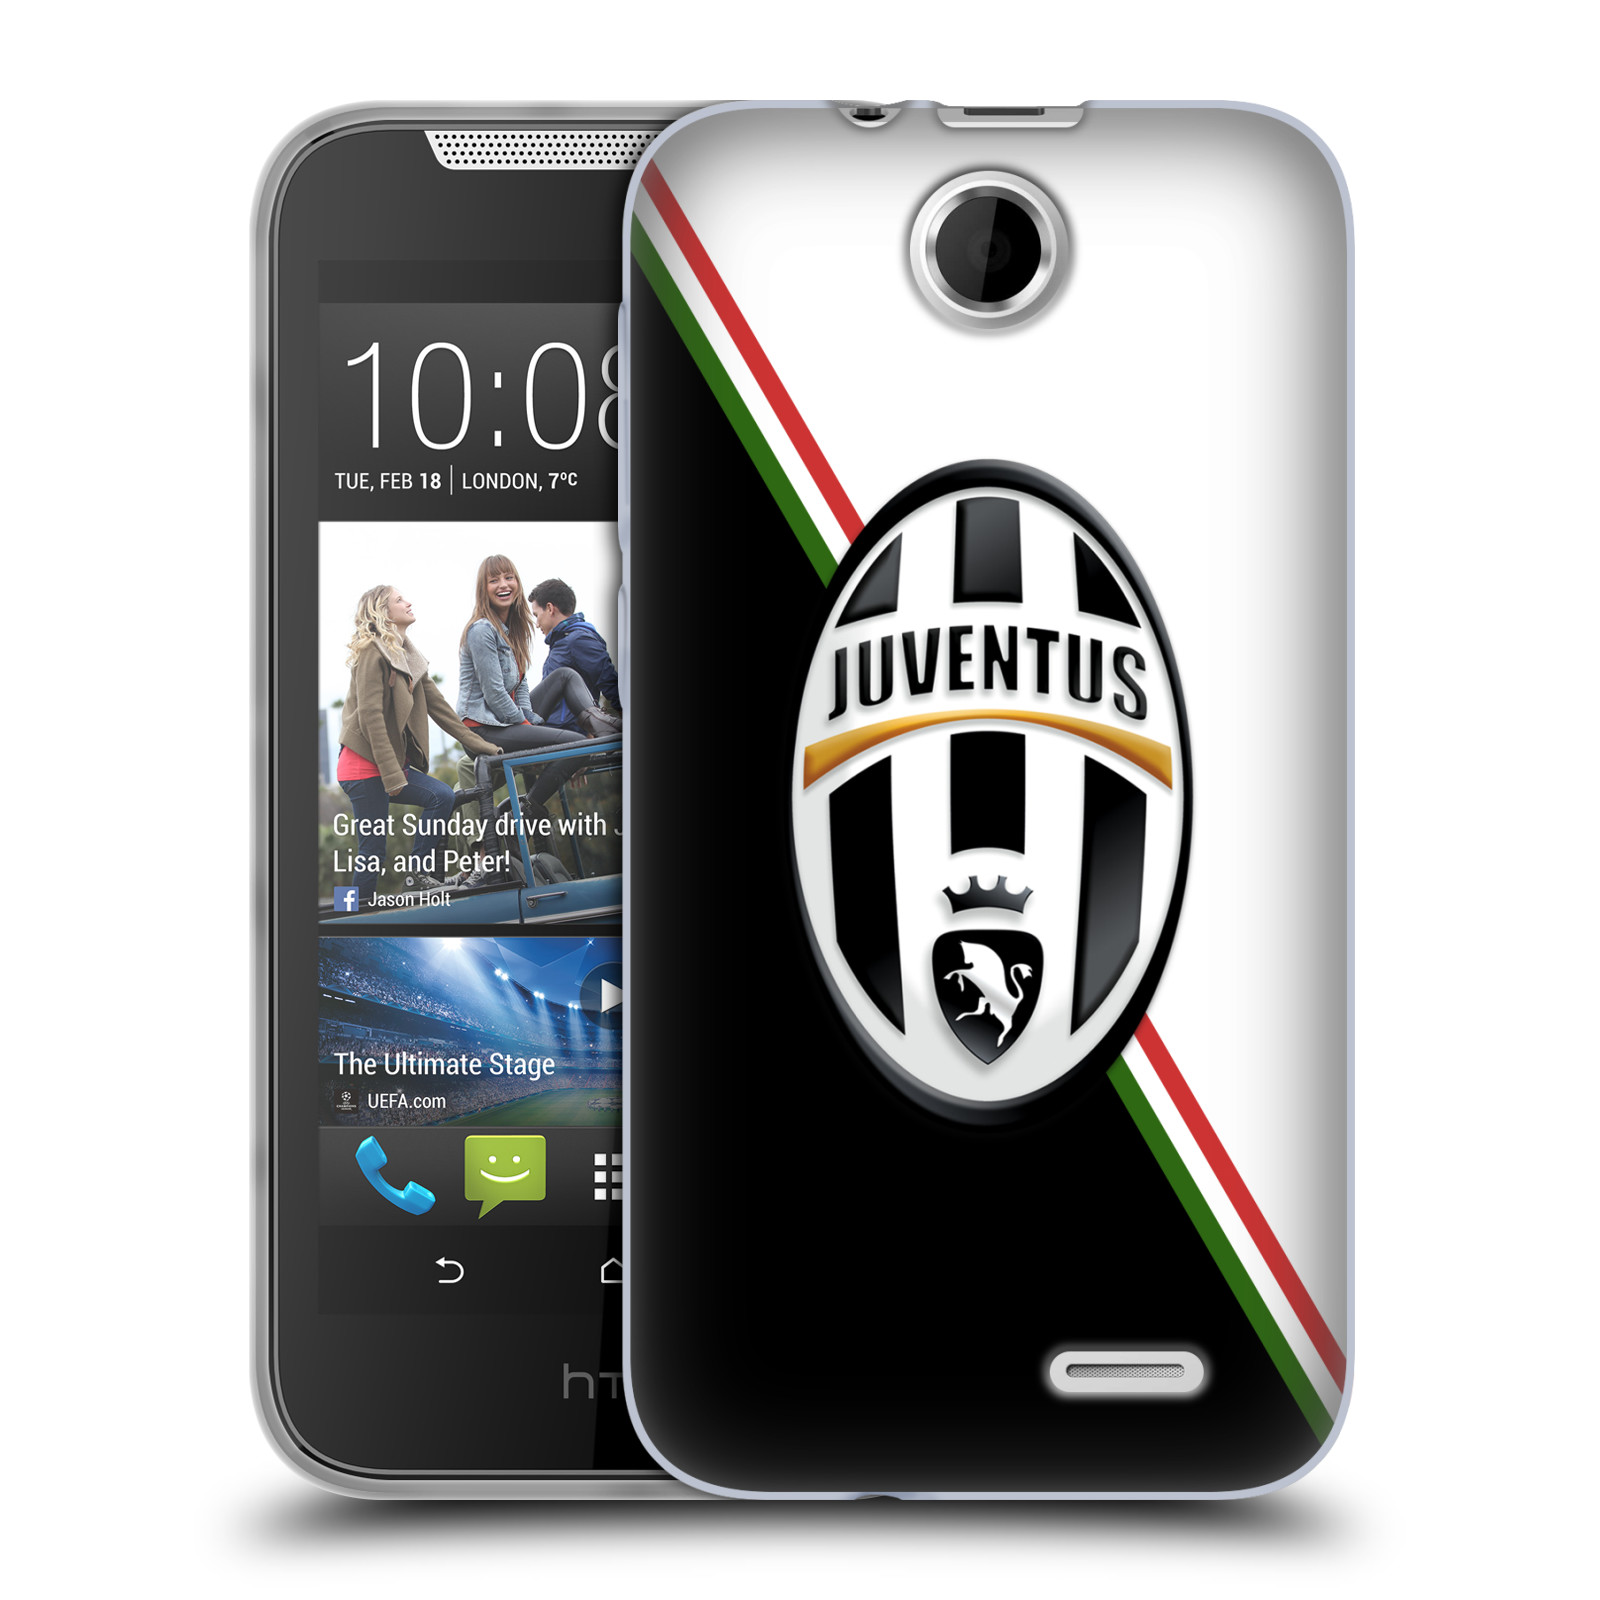 Silikonové pouzdro na mobil HTC Desire 310 HEAD CASE Juventus FC - Black and White (Silikonový kryt či obal na mobilní telefon Juventus FC Official pro HTC Desire 310)